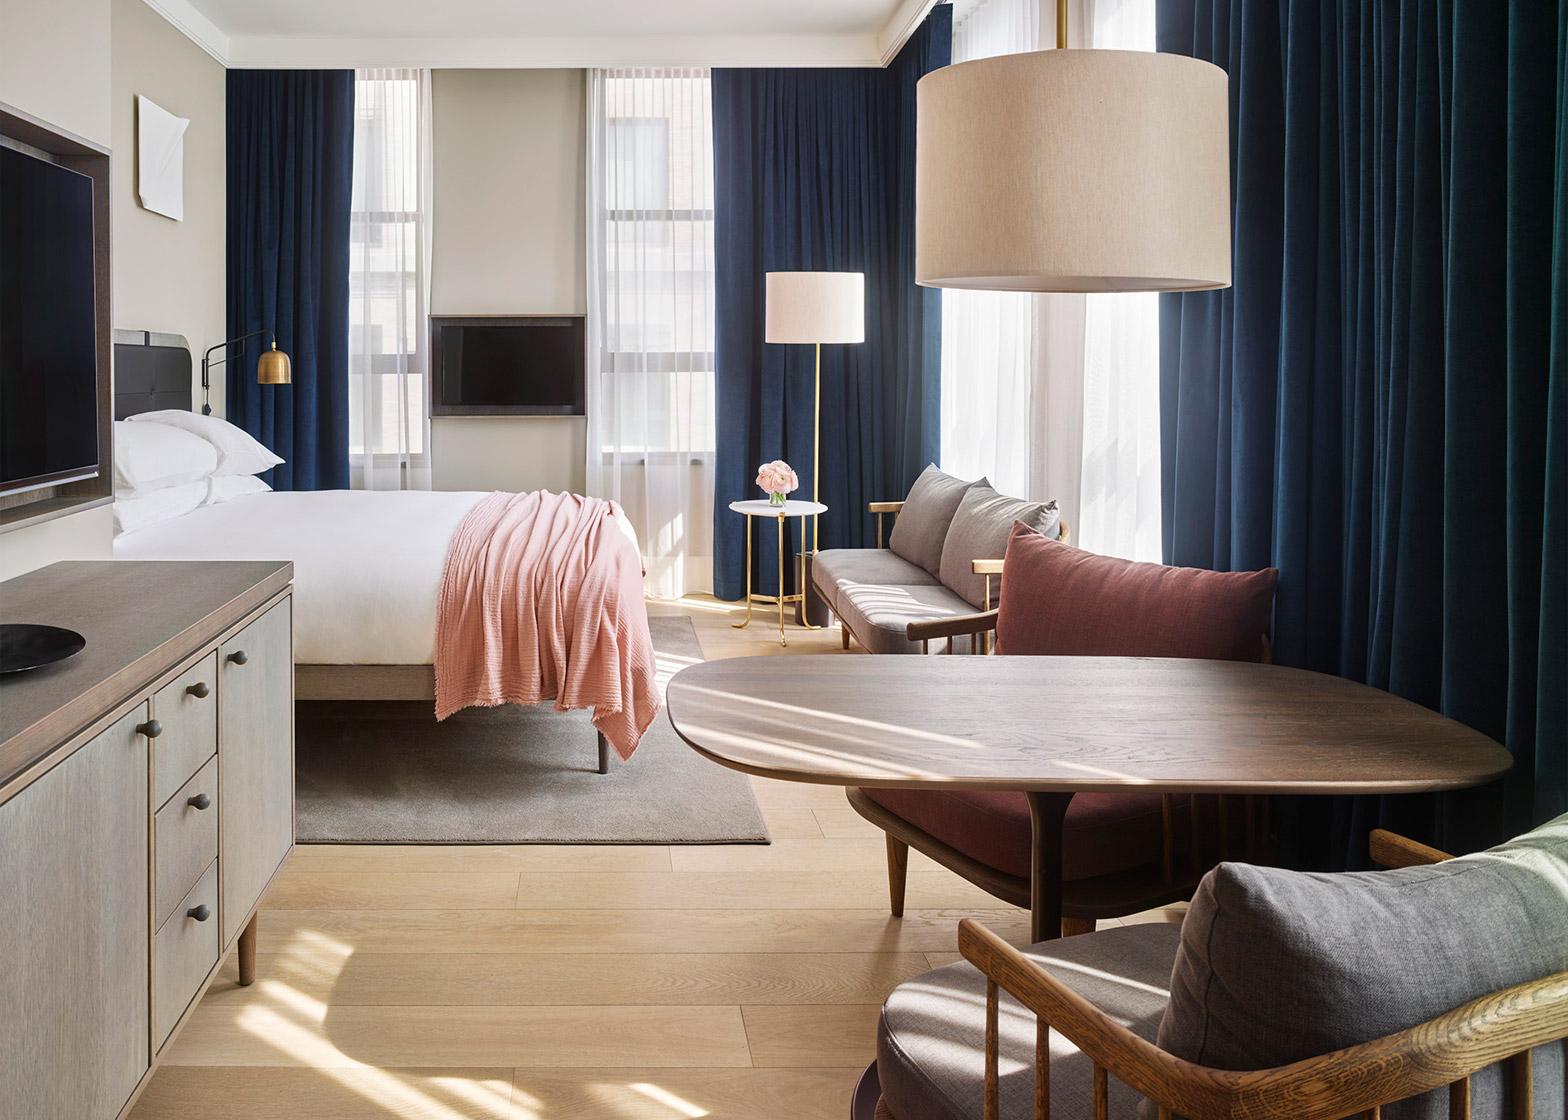 11-howard-space-copenhagen-hotel-interior-new-york-city-soho-usa_dezeen_1568_8